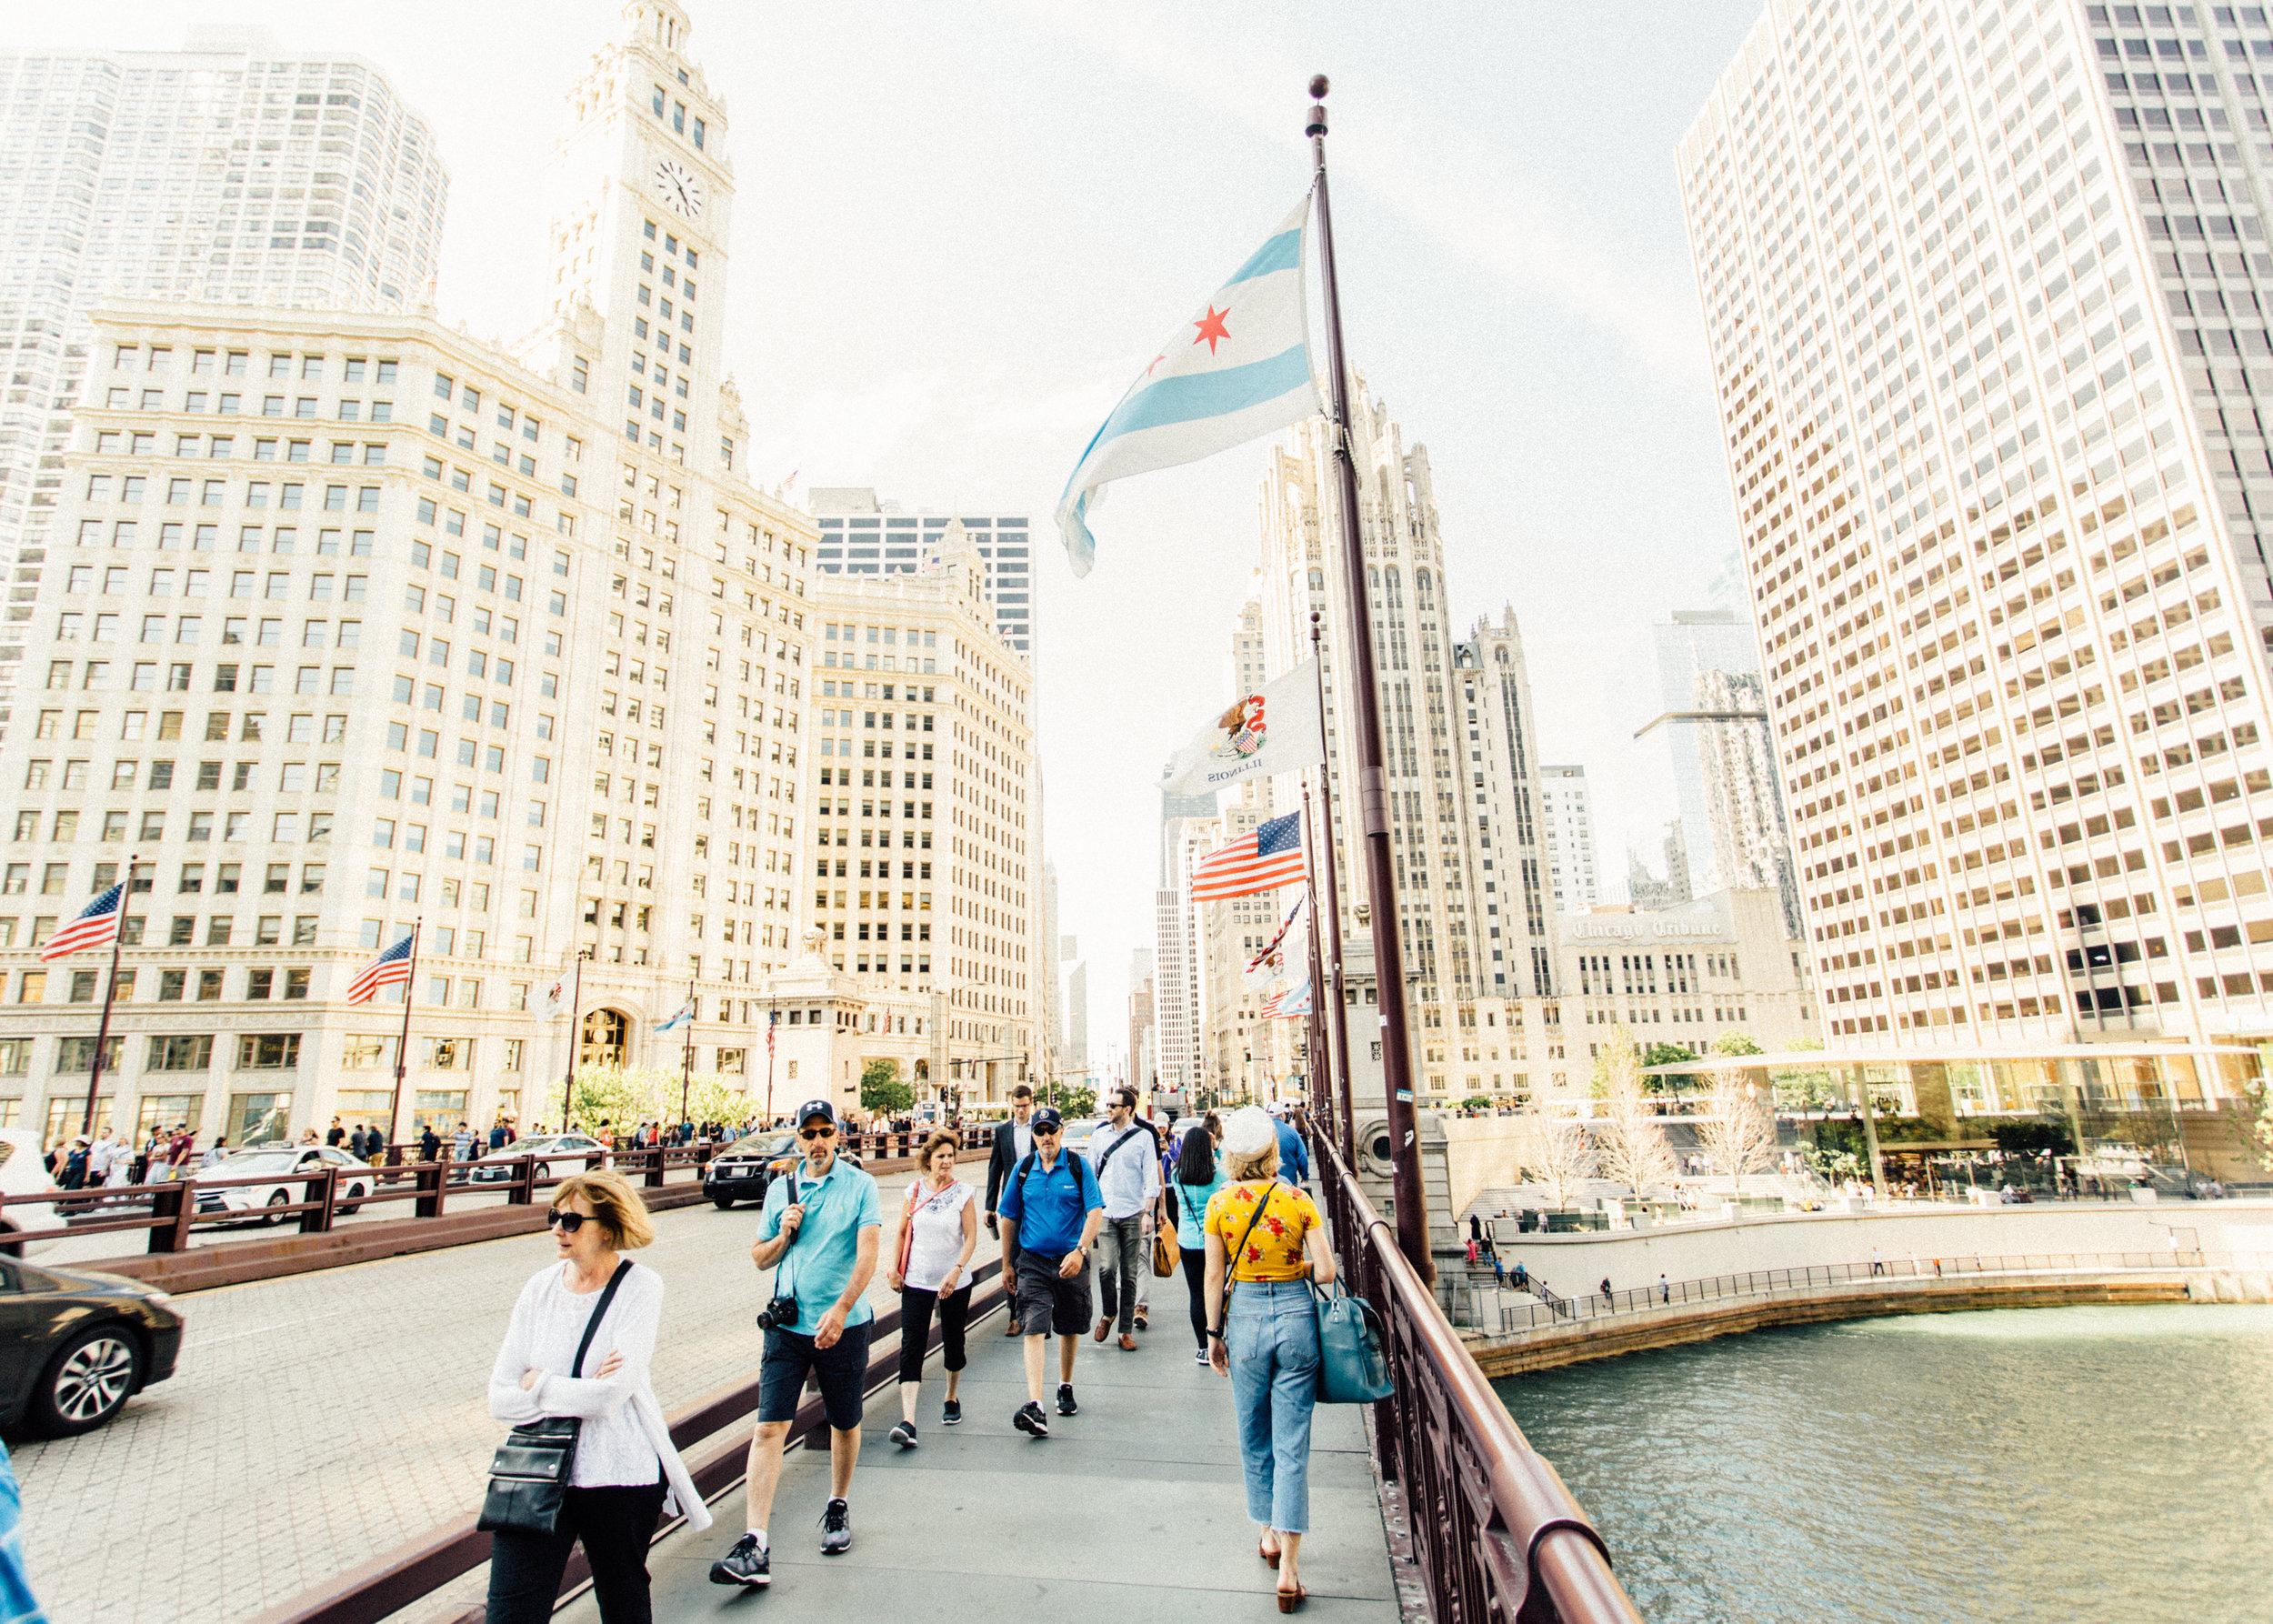 NSR_Chicago_Exploring_201806-6224.jpg